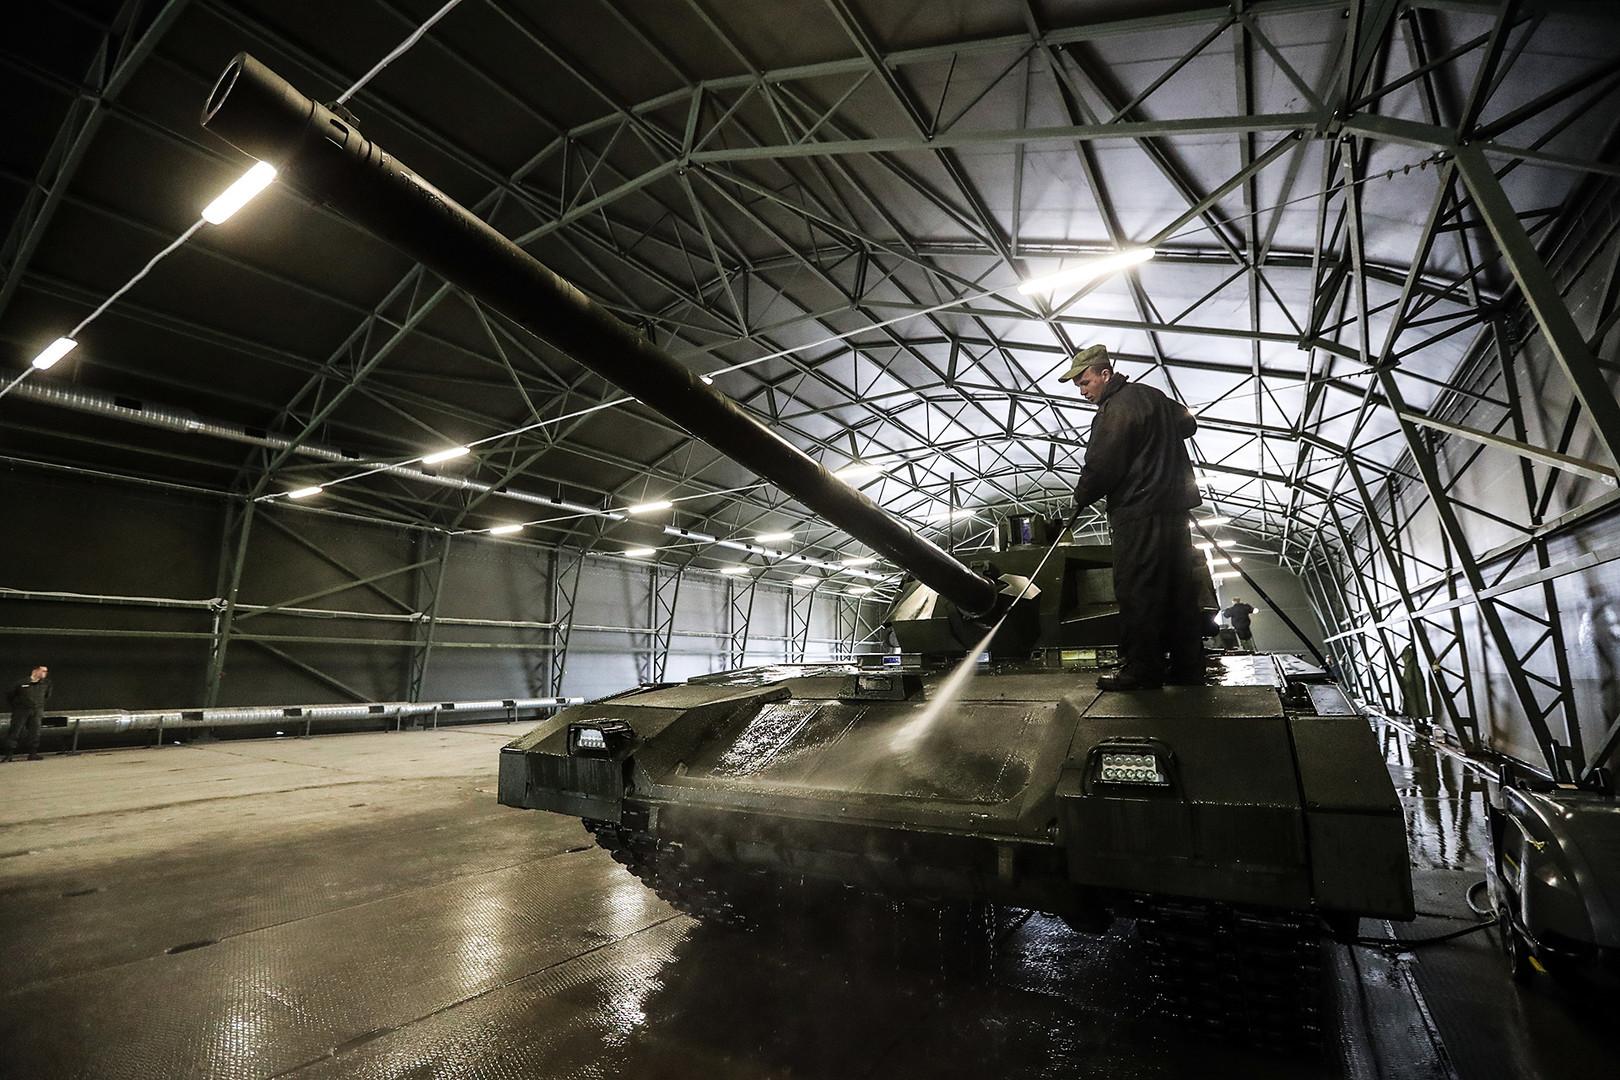 Seorang petugas membersihkan tank T-14 Armata di Moskow.